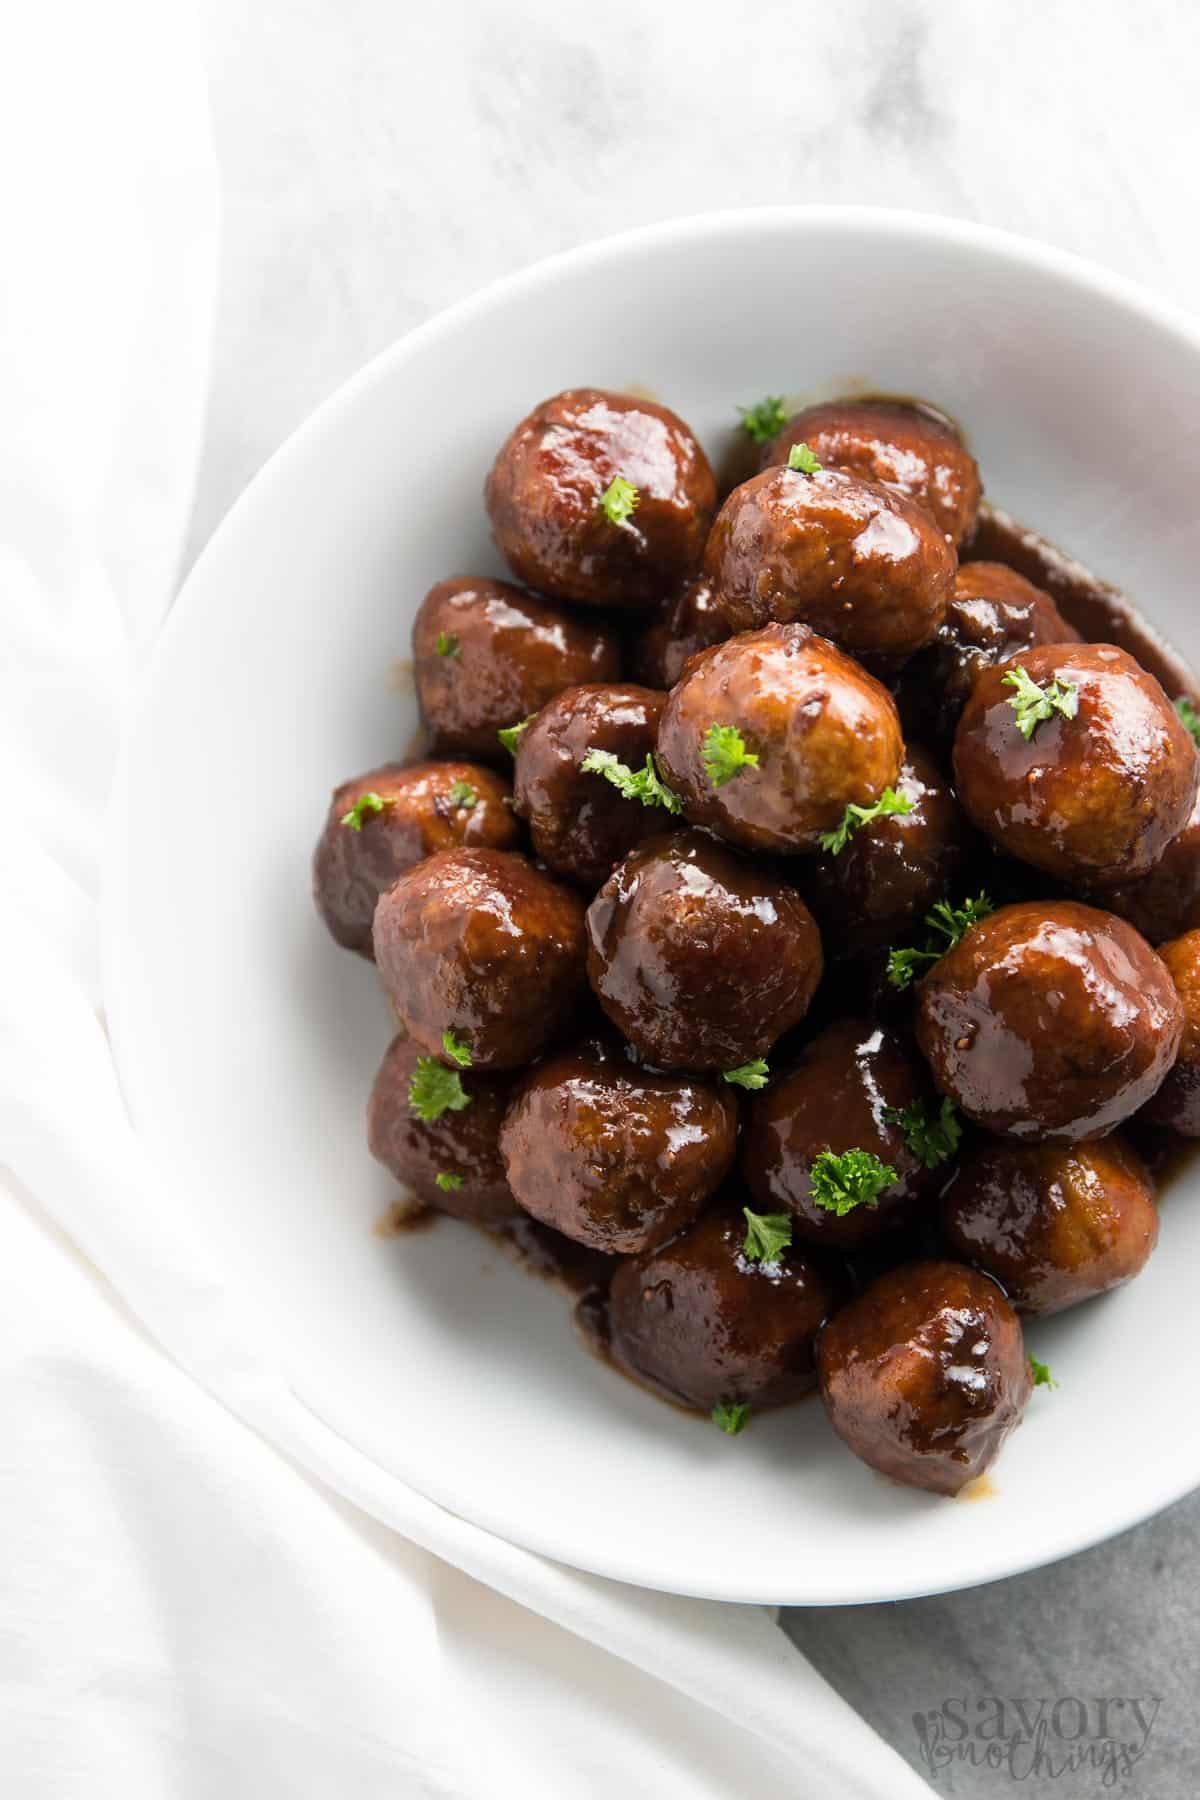 Turkey meatball recipes crock pot easy